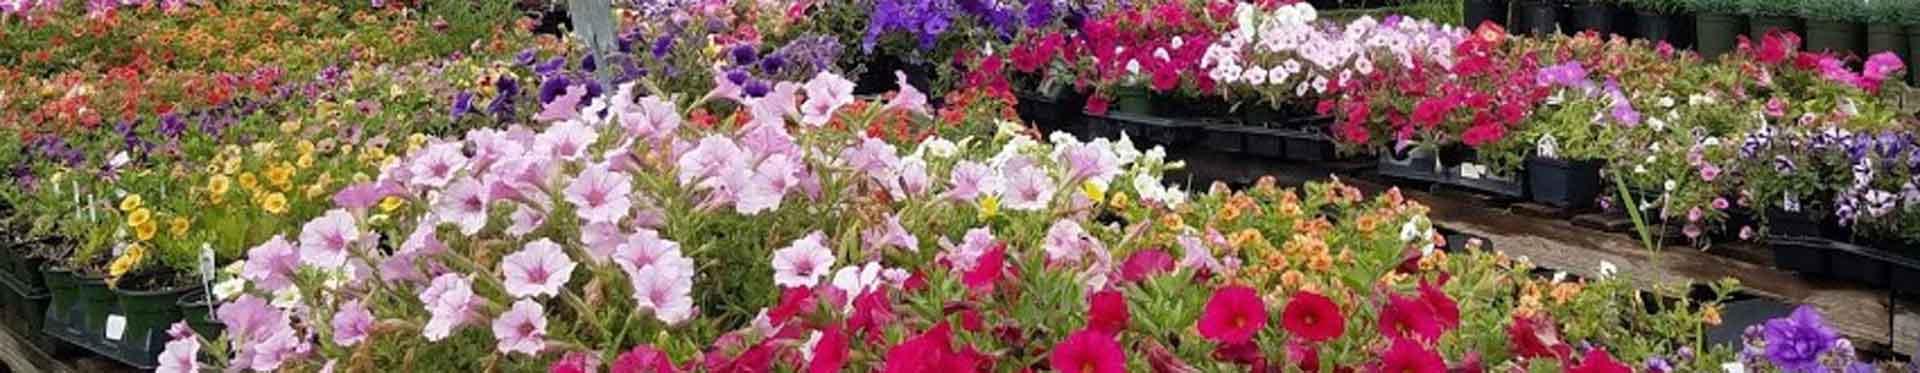 plantscape greenhouses